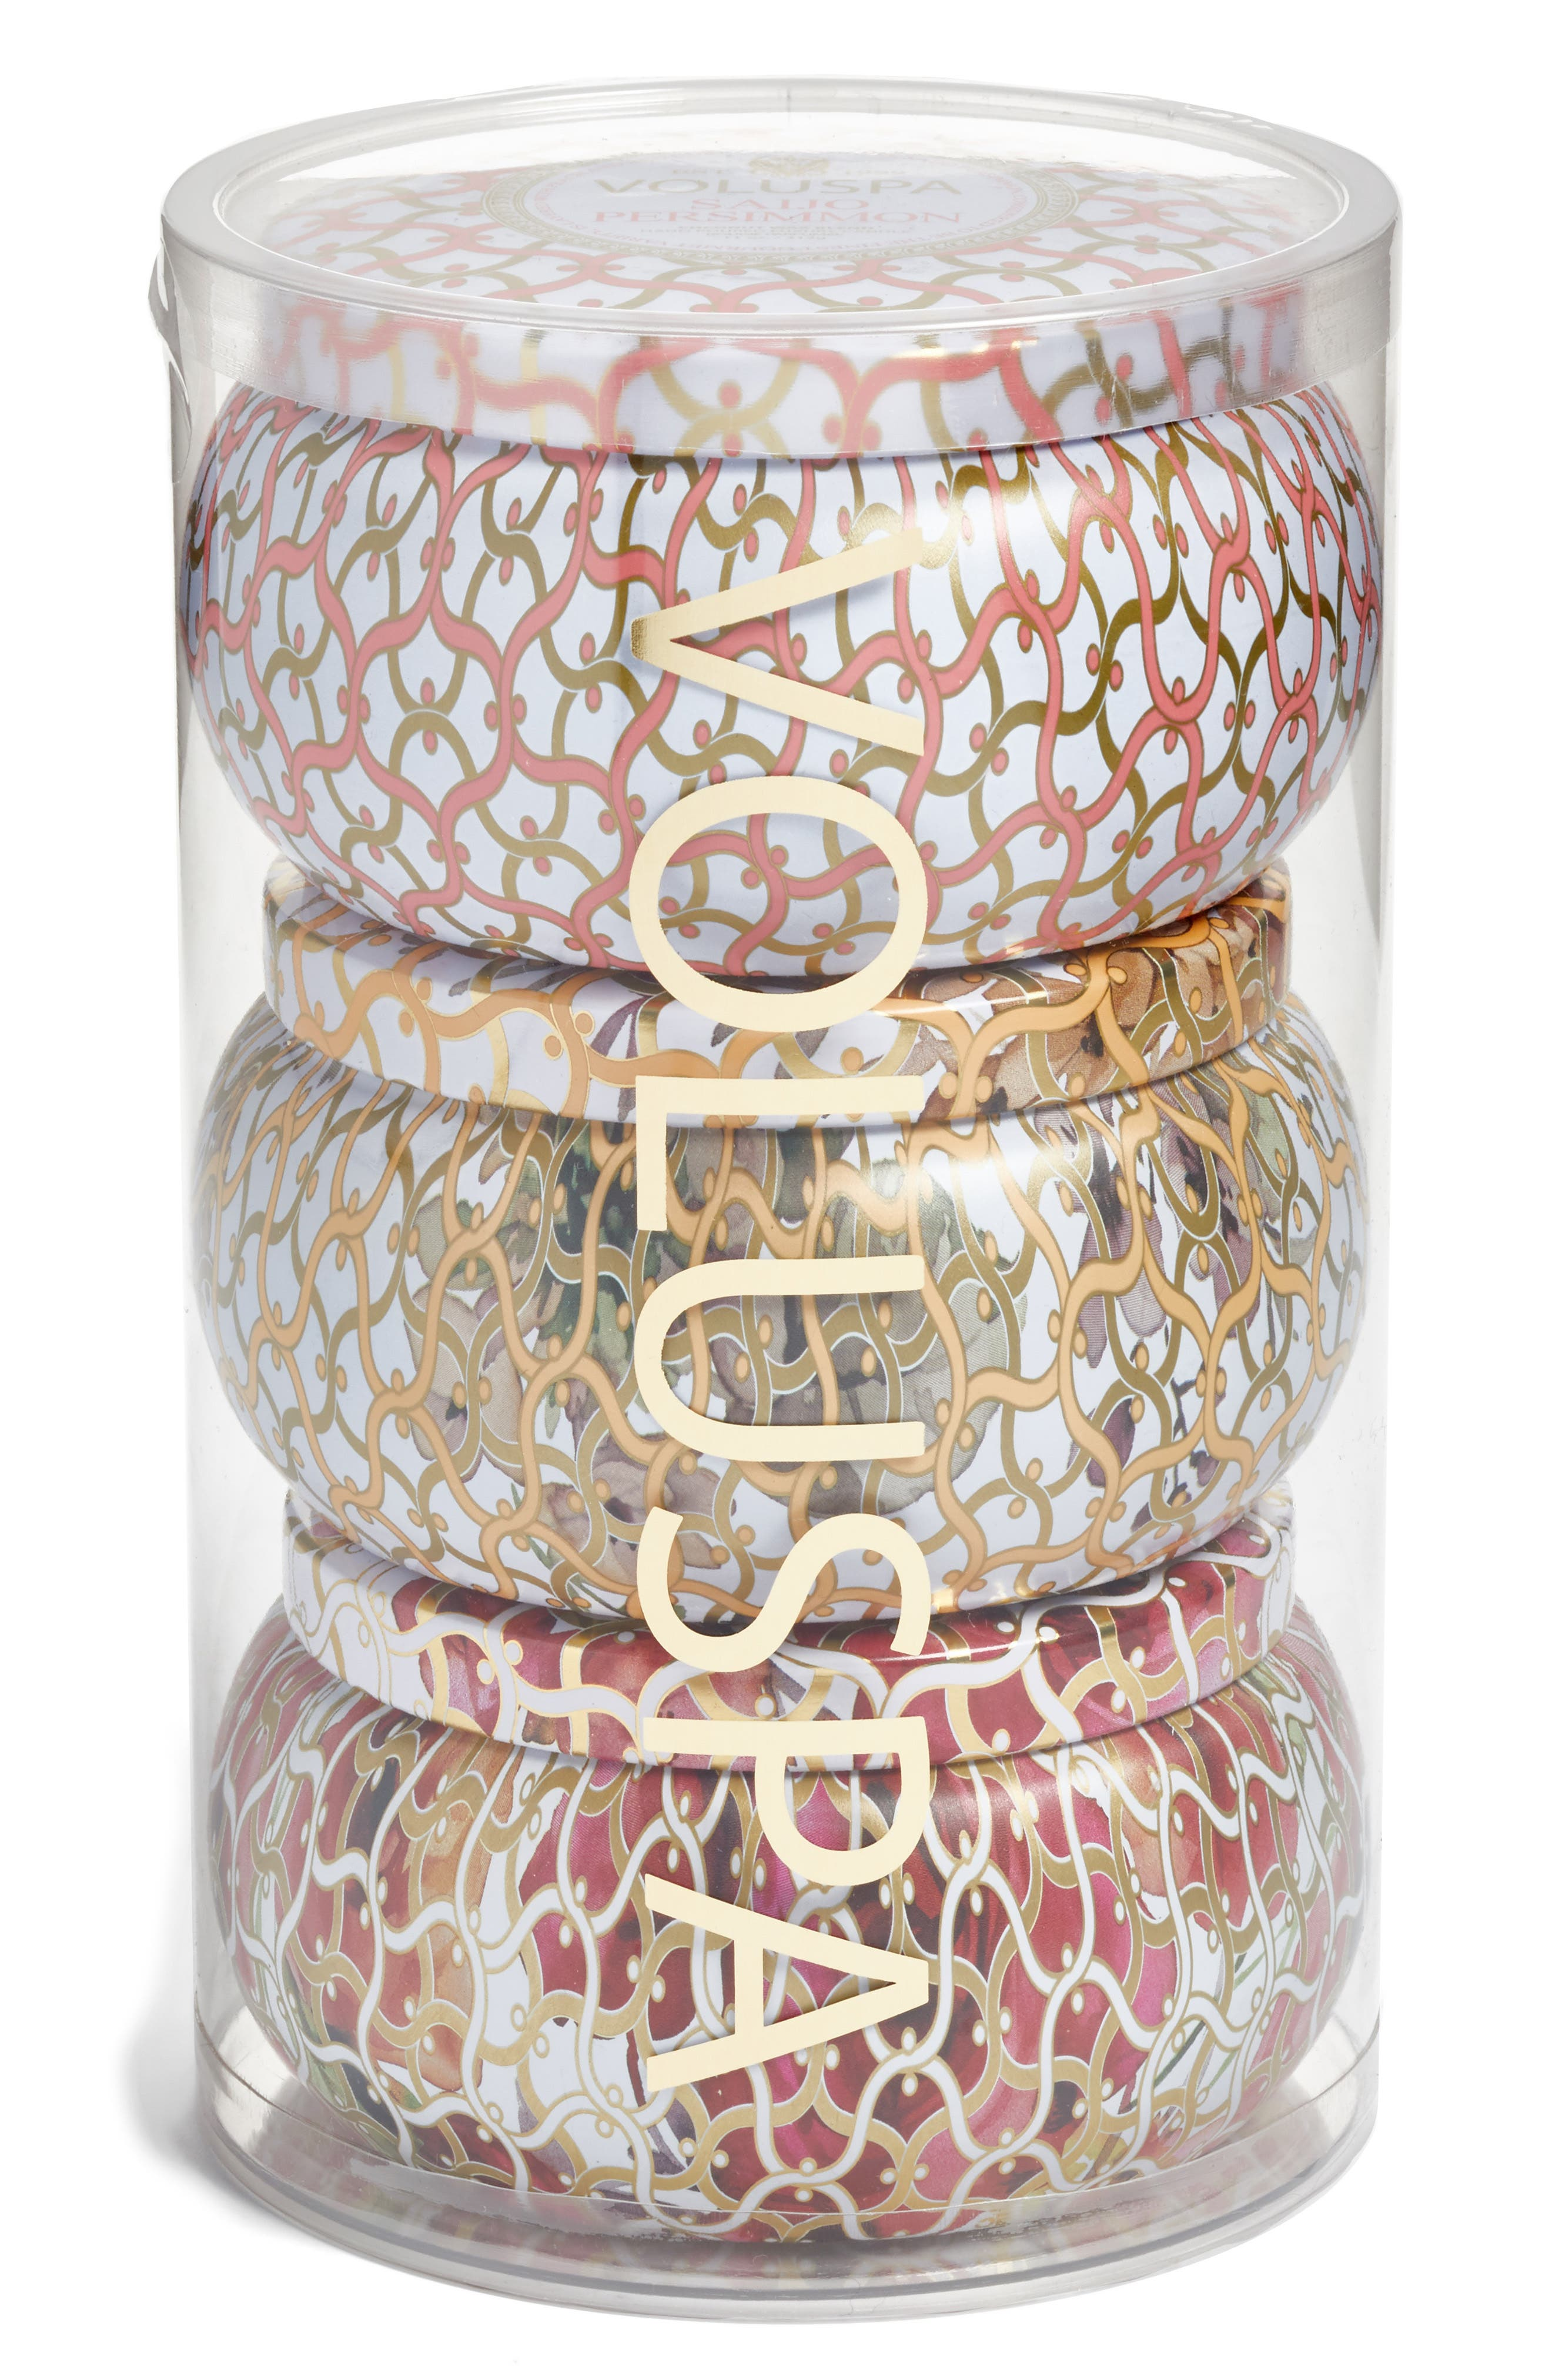 Main Image - Voluspa Maison Blanc Two-Wick Tin Candle Set